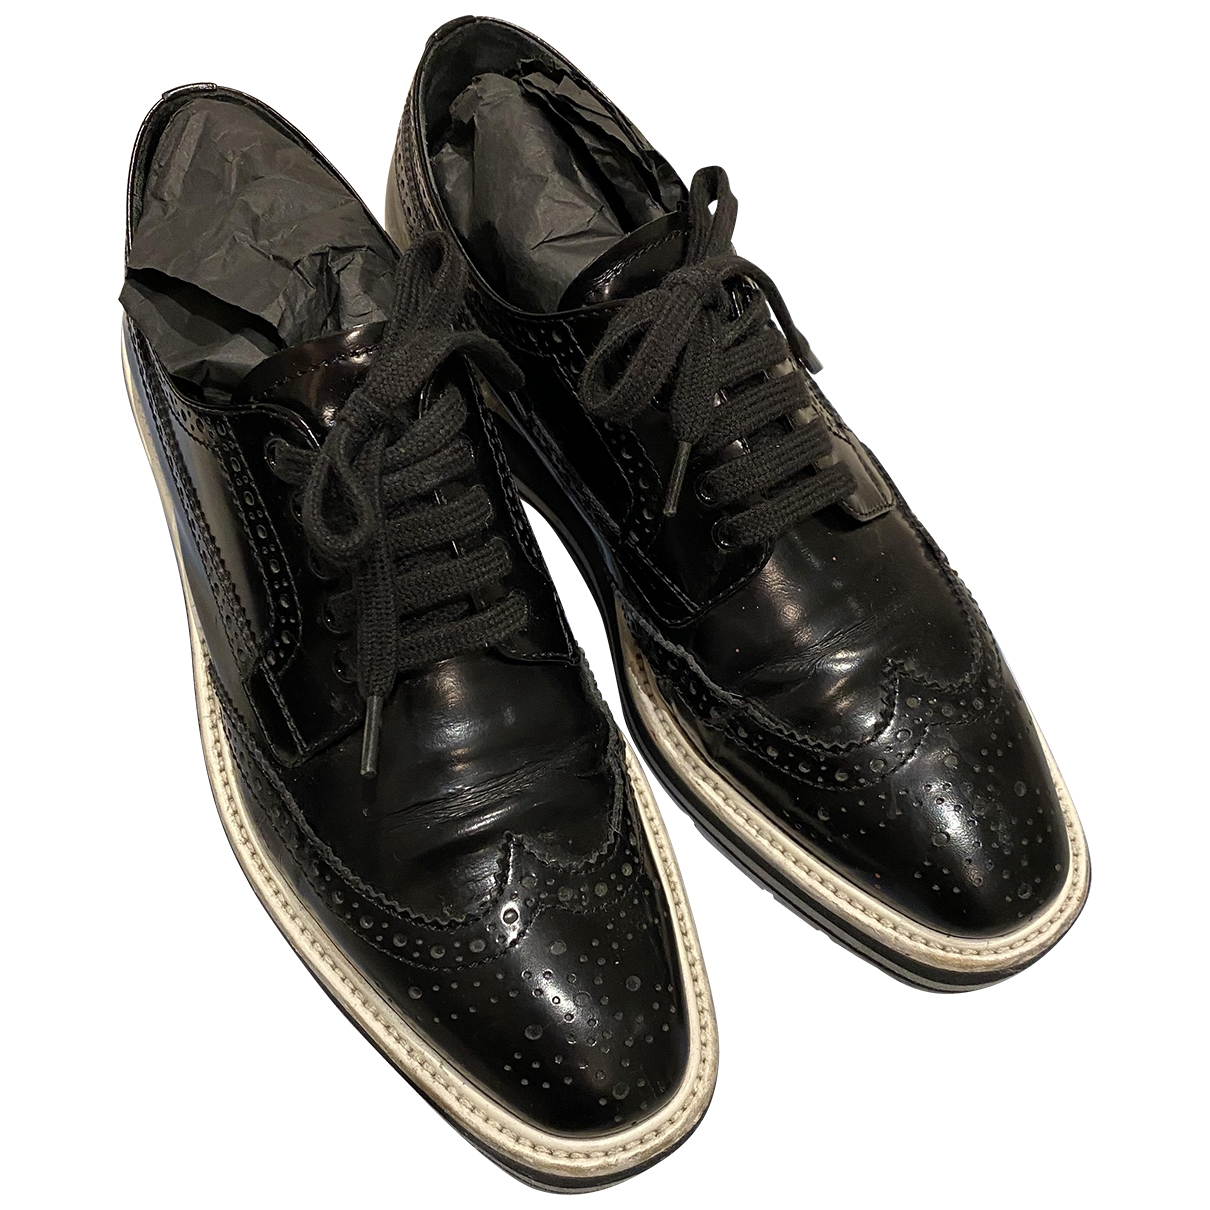 Prada \N Black Leather Lace ups for Women 37 EU